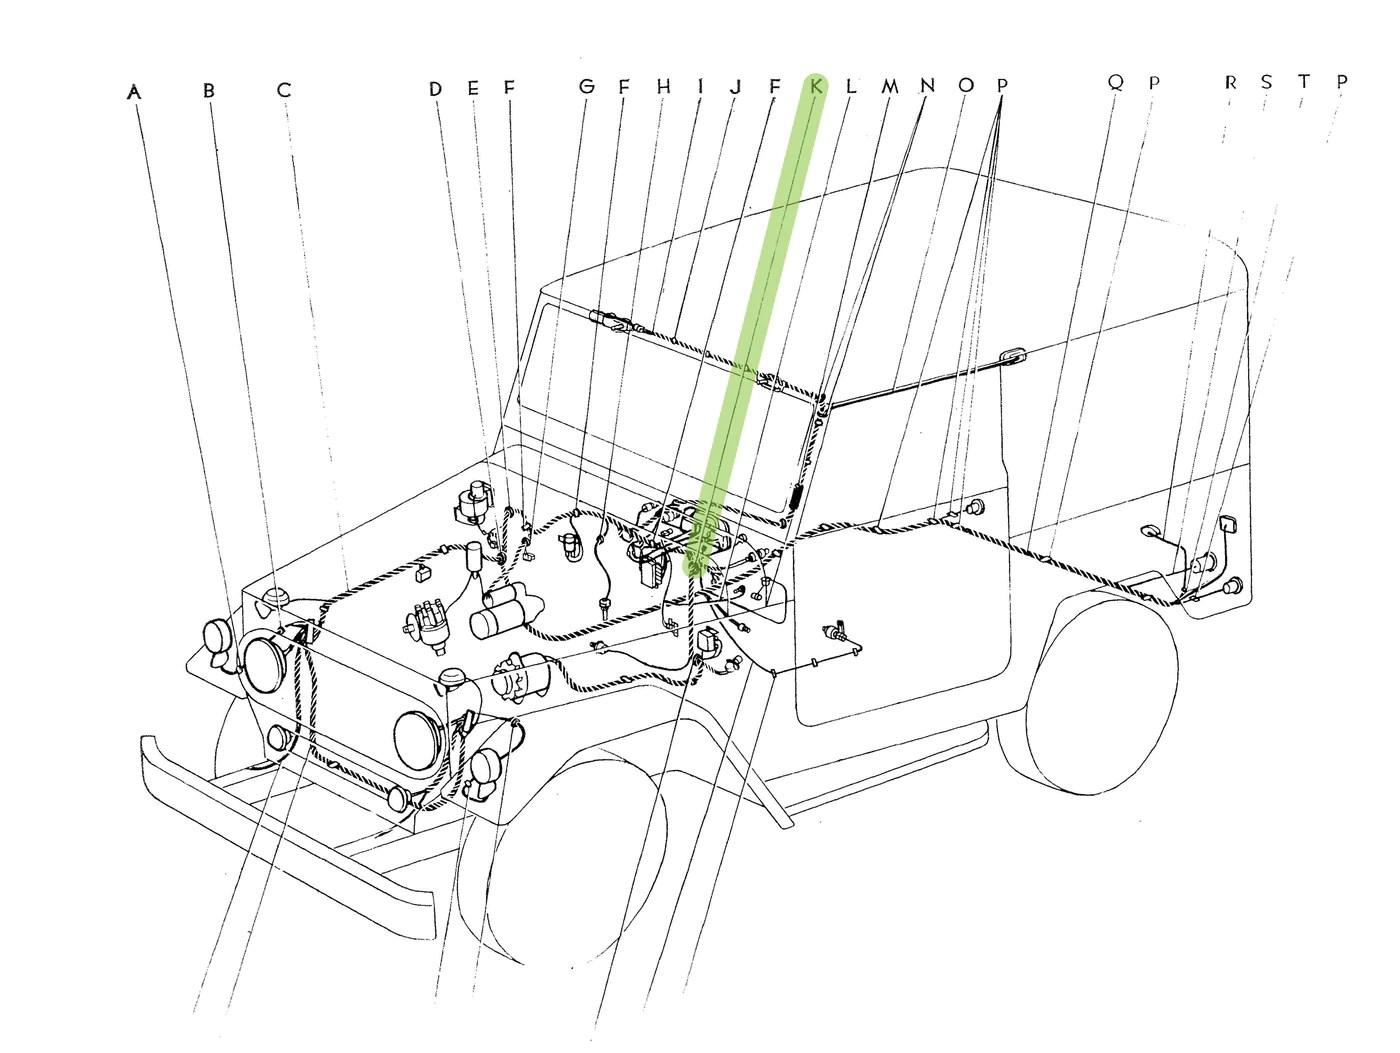 medium resolution of wiring diagram grommet key wiring diagram img firewall grommet wire harness oem fj40 fj45